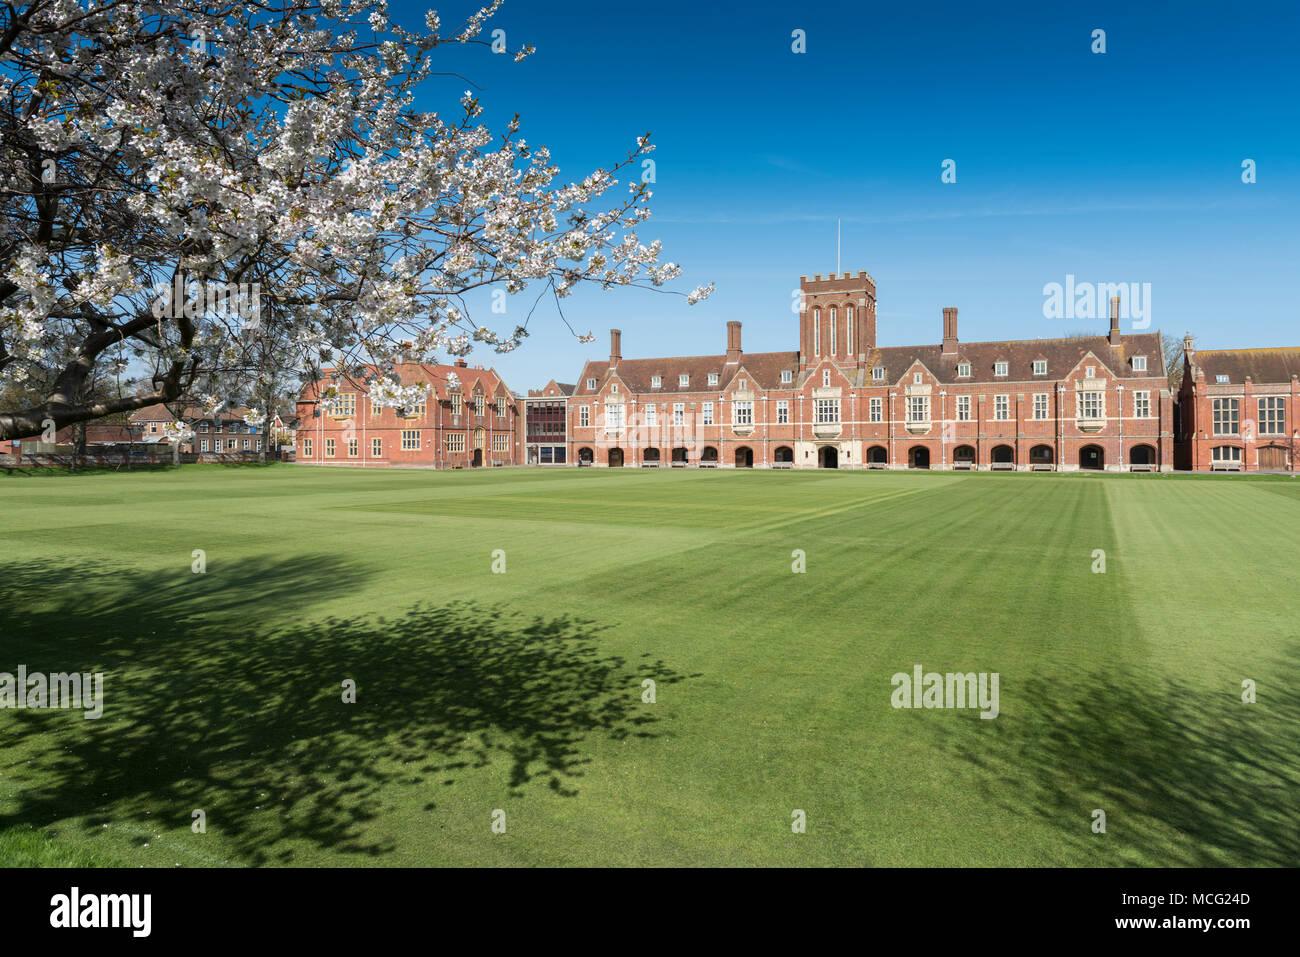 Eastbourne College, in Eastbourne, East Sussex, UK - Stock Image